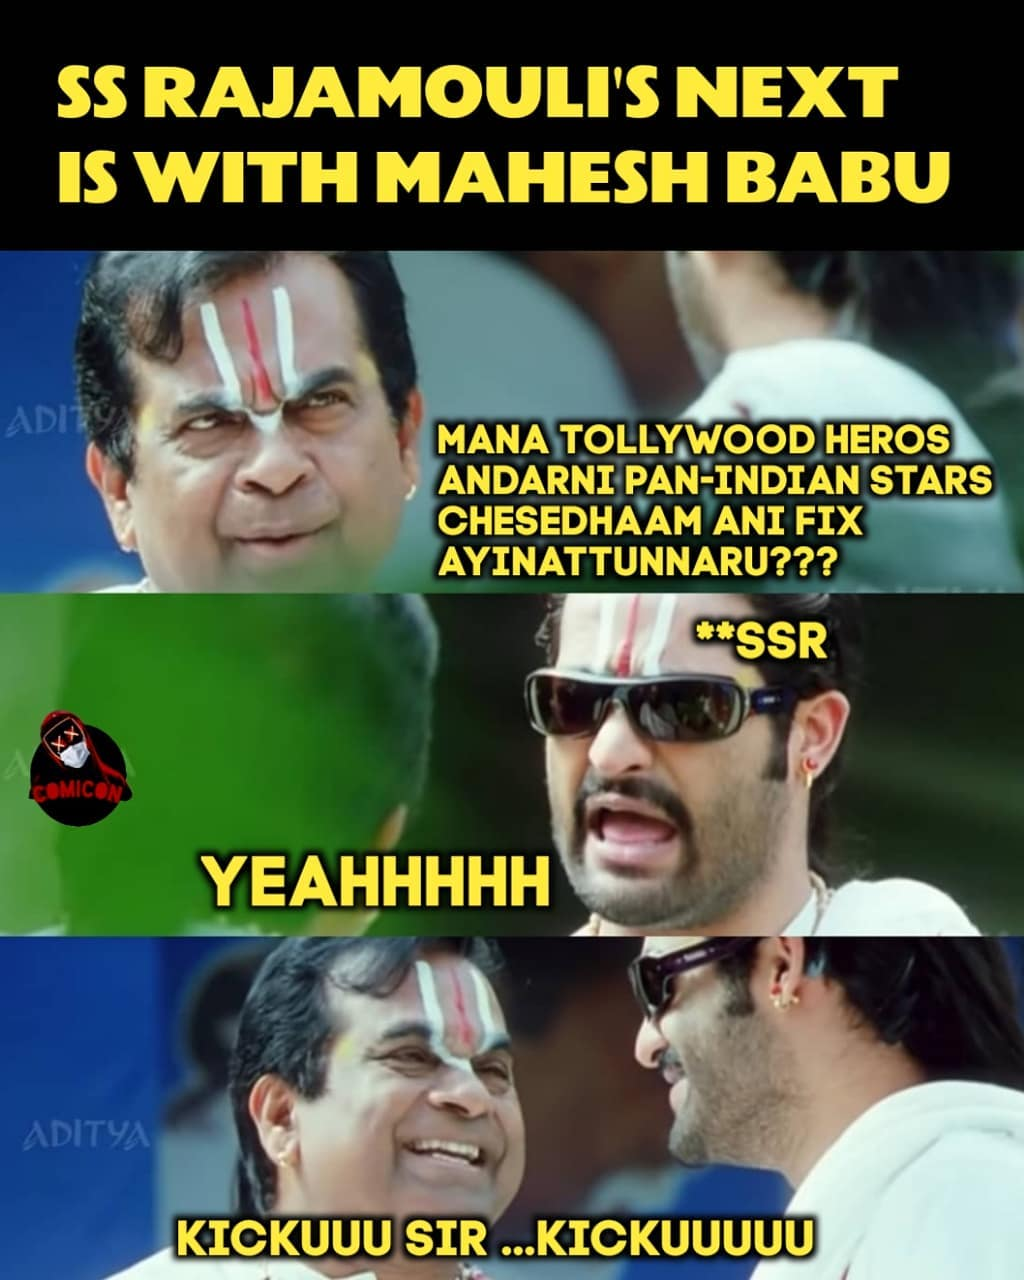 5. Mahesh Babu And Ss Rajamouli Memes